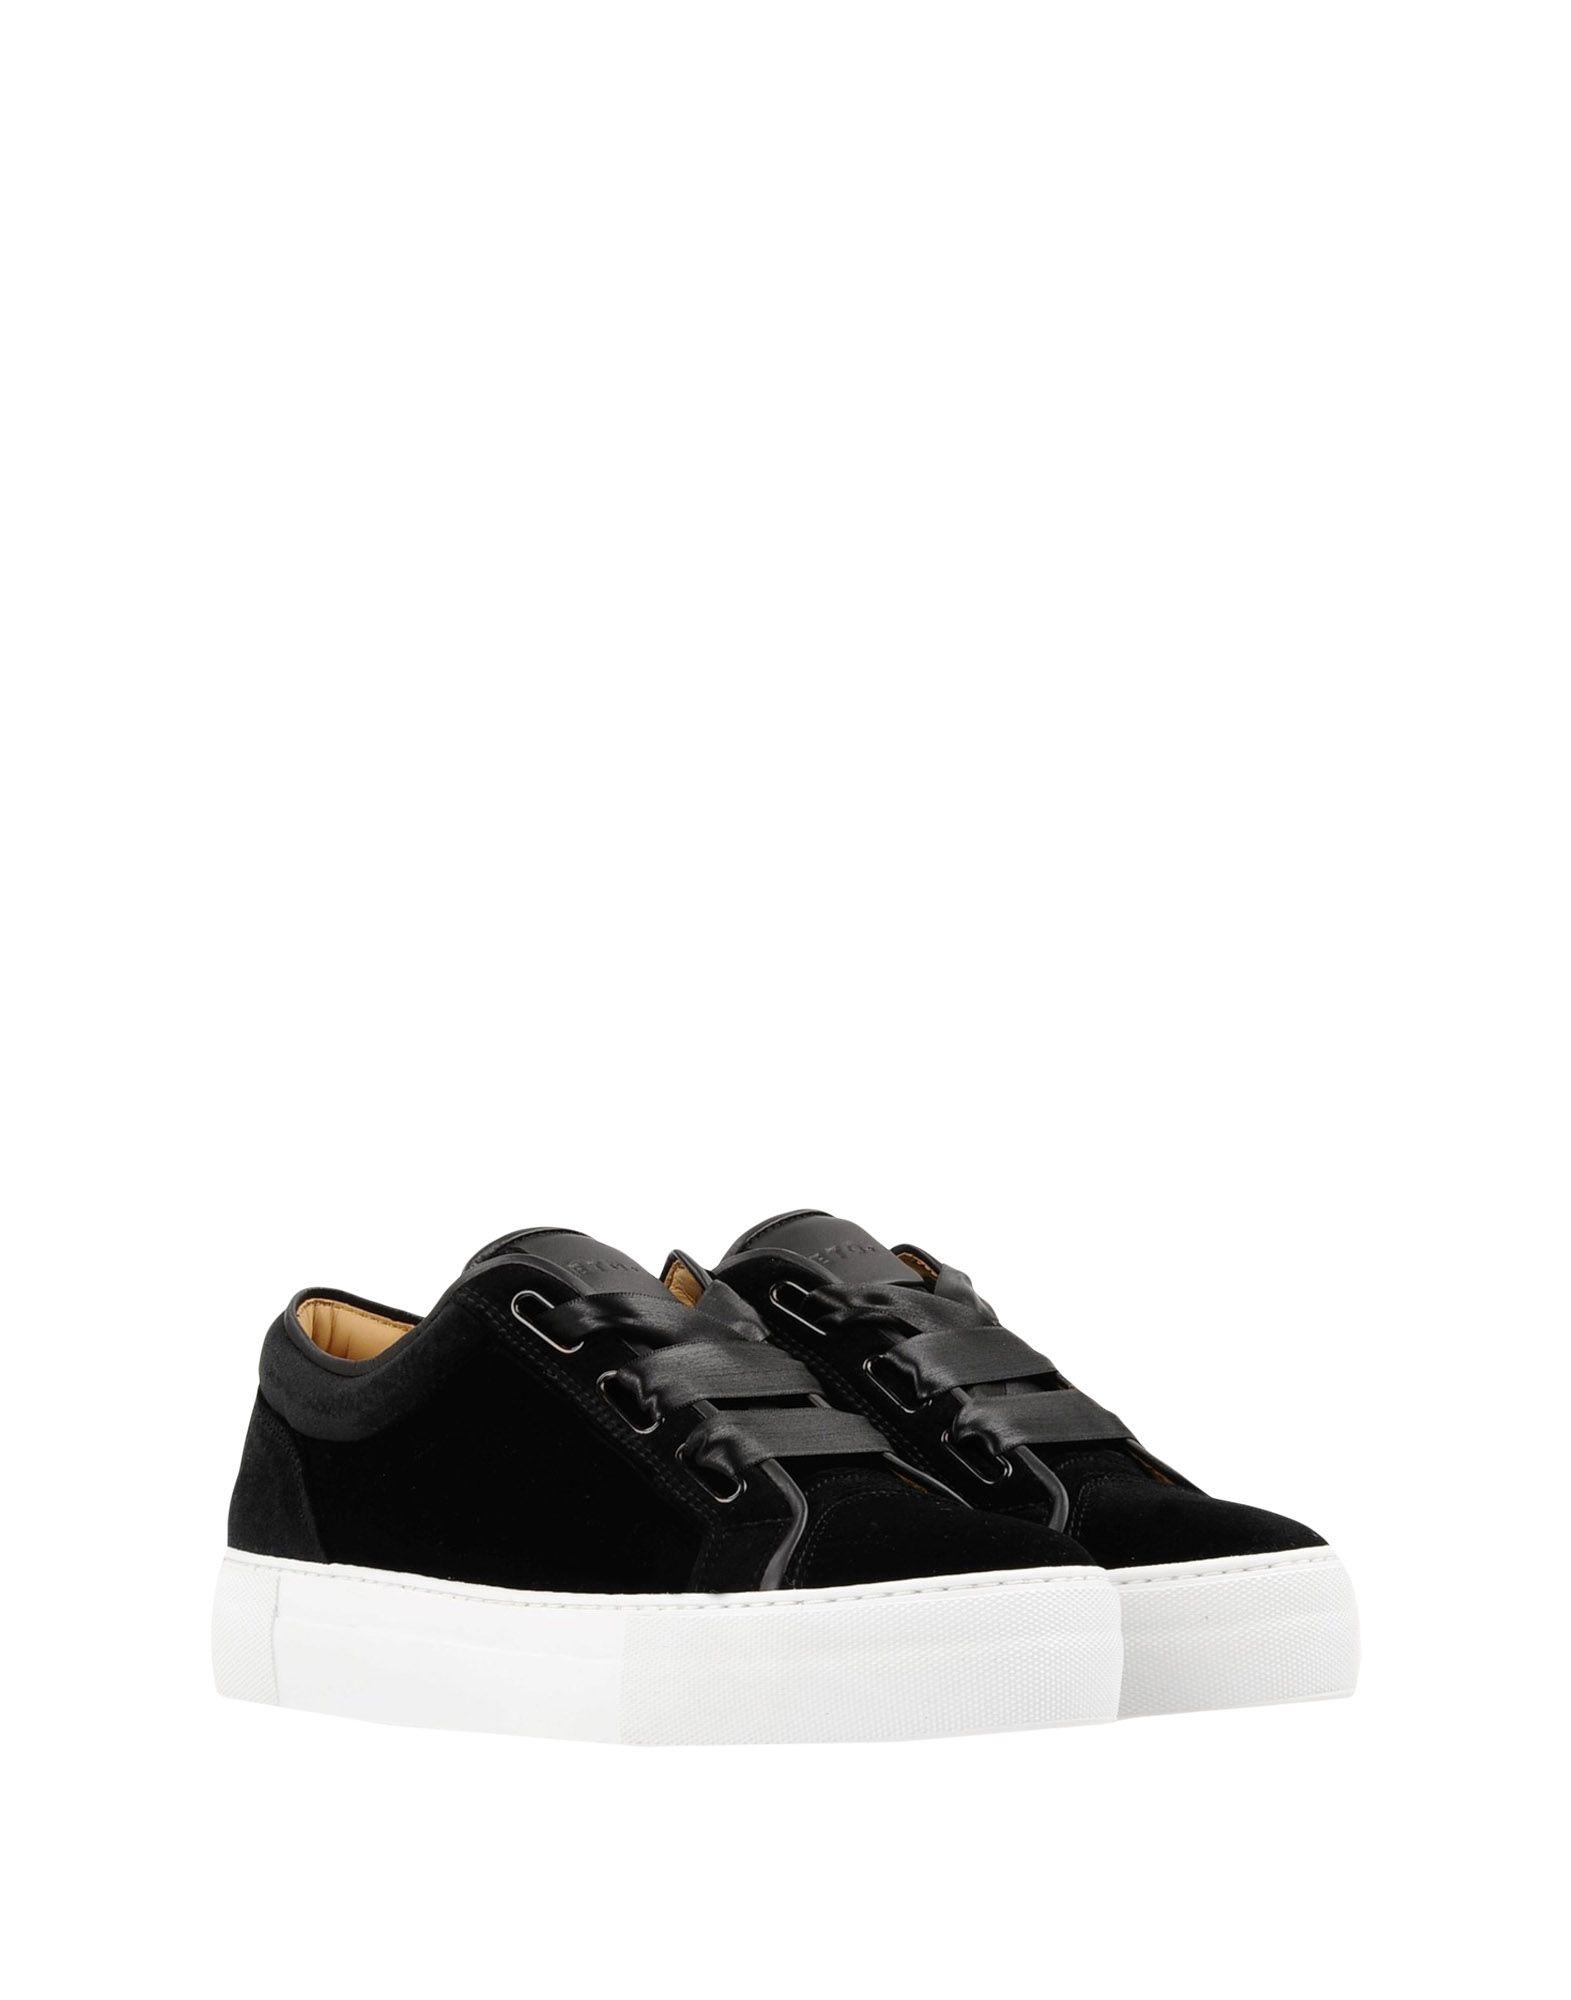 Etq Amsterdam Amsterdam Amsterdam Sneakers - Women Etq Amsterdam Sneakers online on  United Kingdom - 11339444RD 40ce31